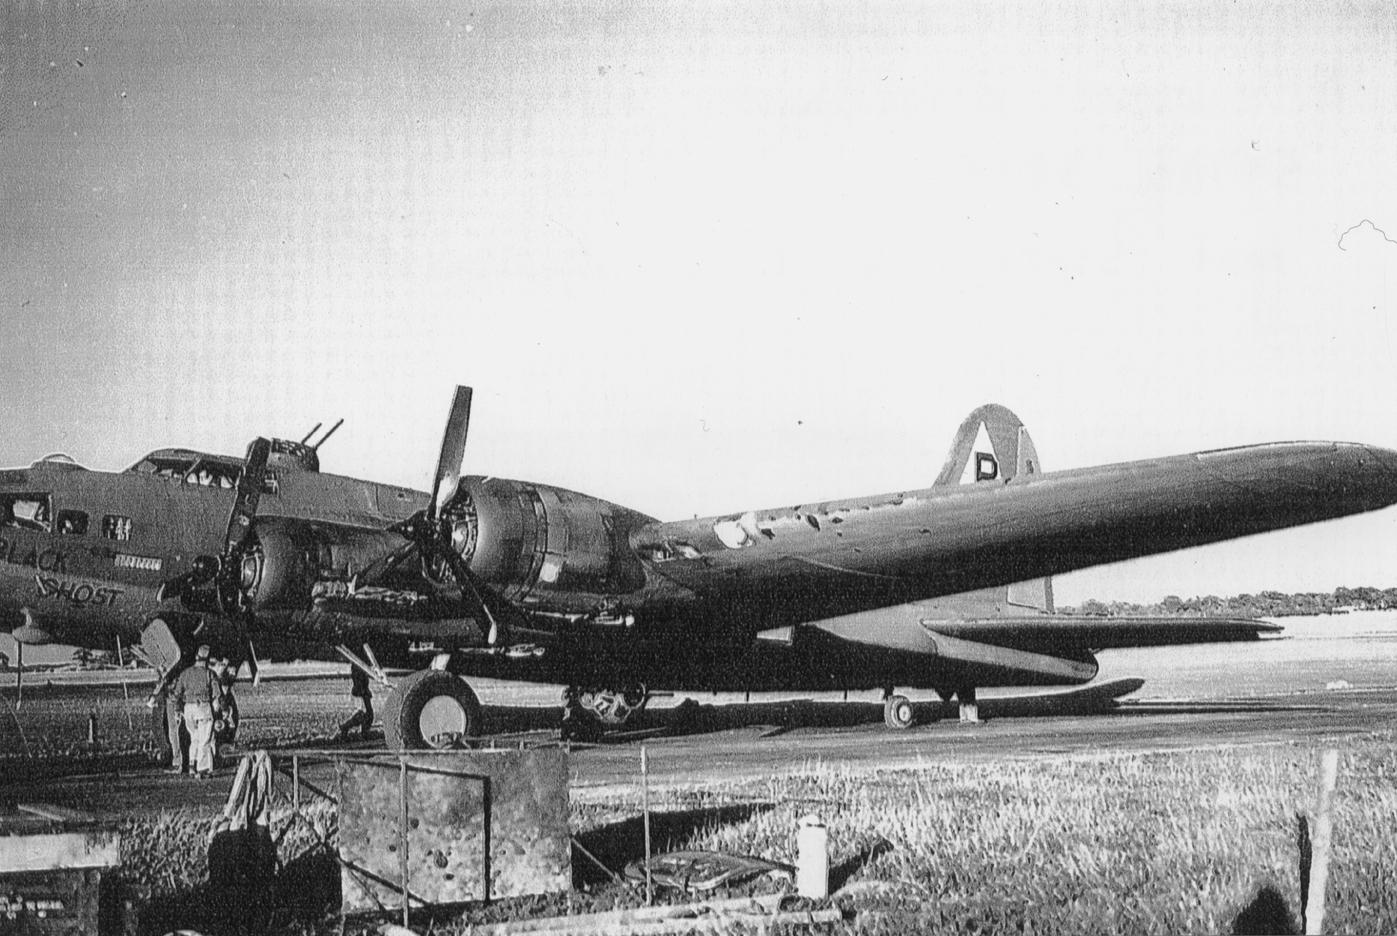 B-17 42-5843